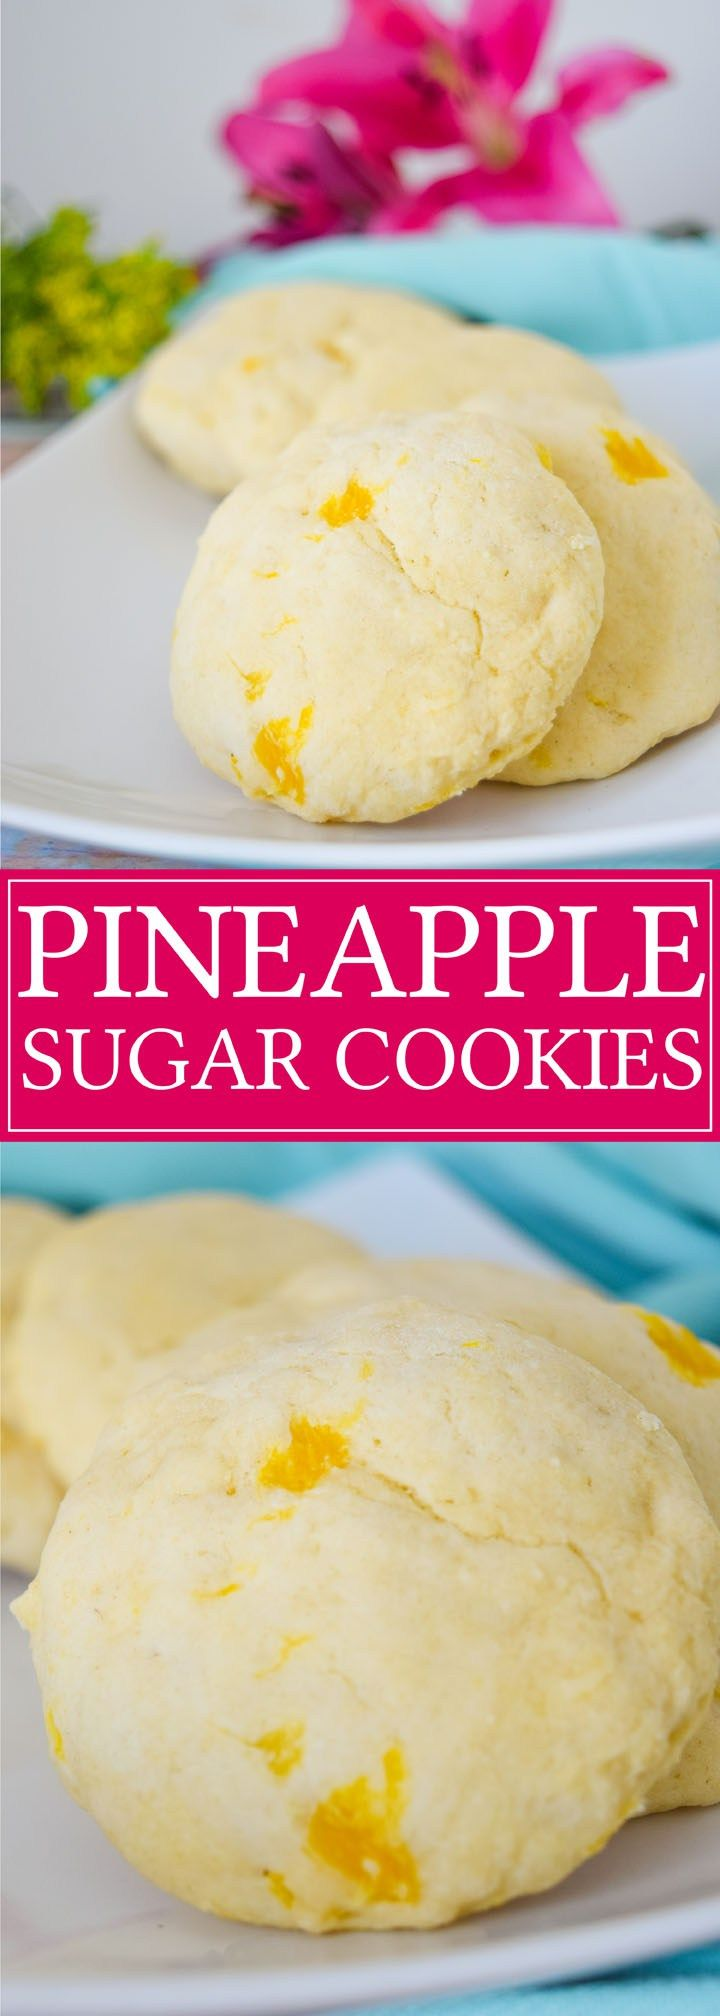 Pineapple Sugar Cookies: A fun alternative to regular sugar cookies with a hint of pineapple!